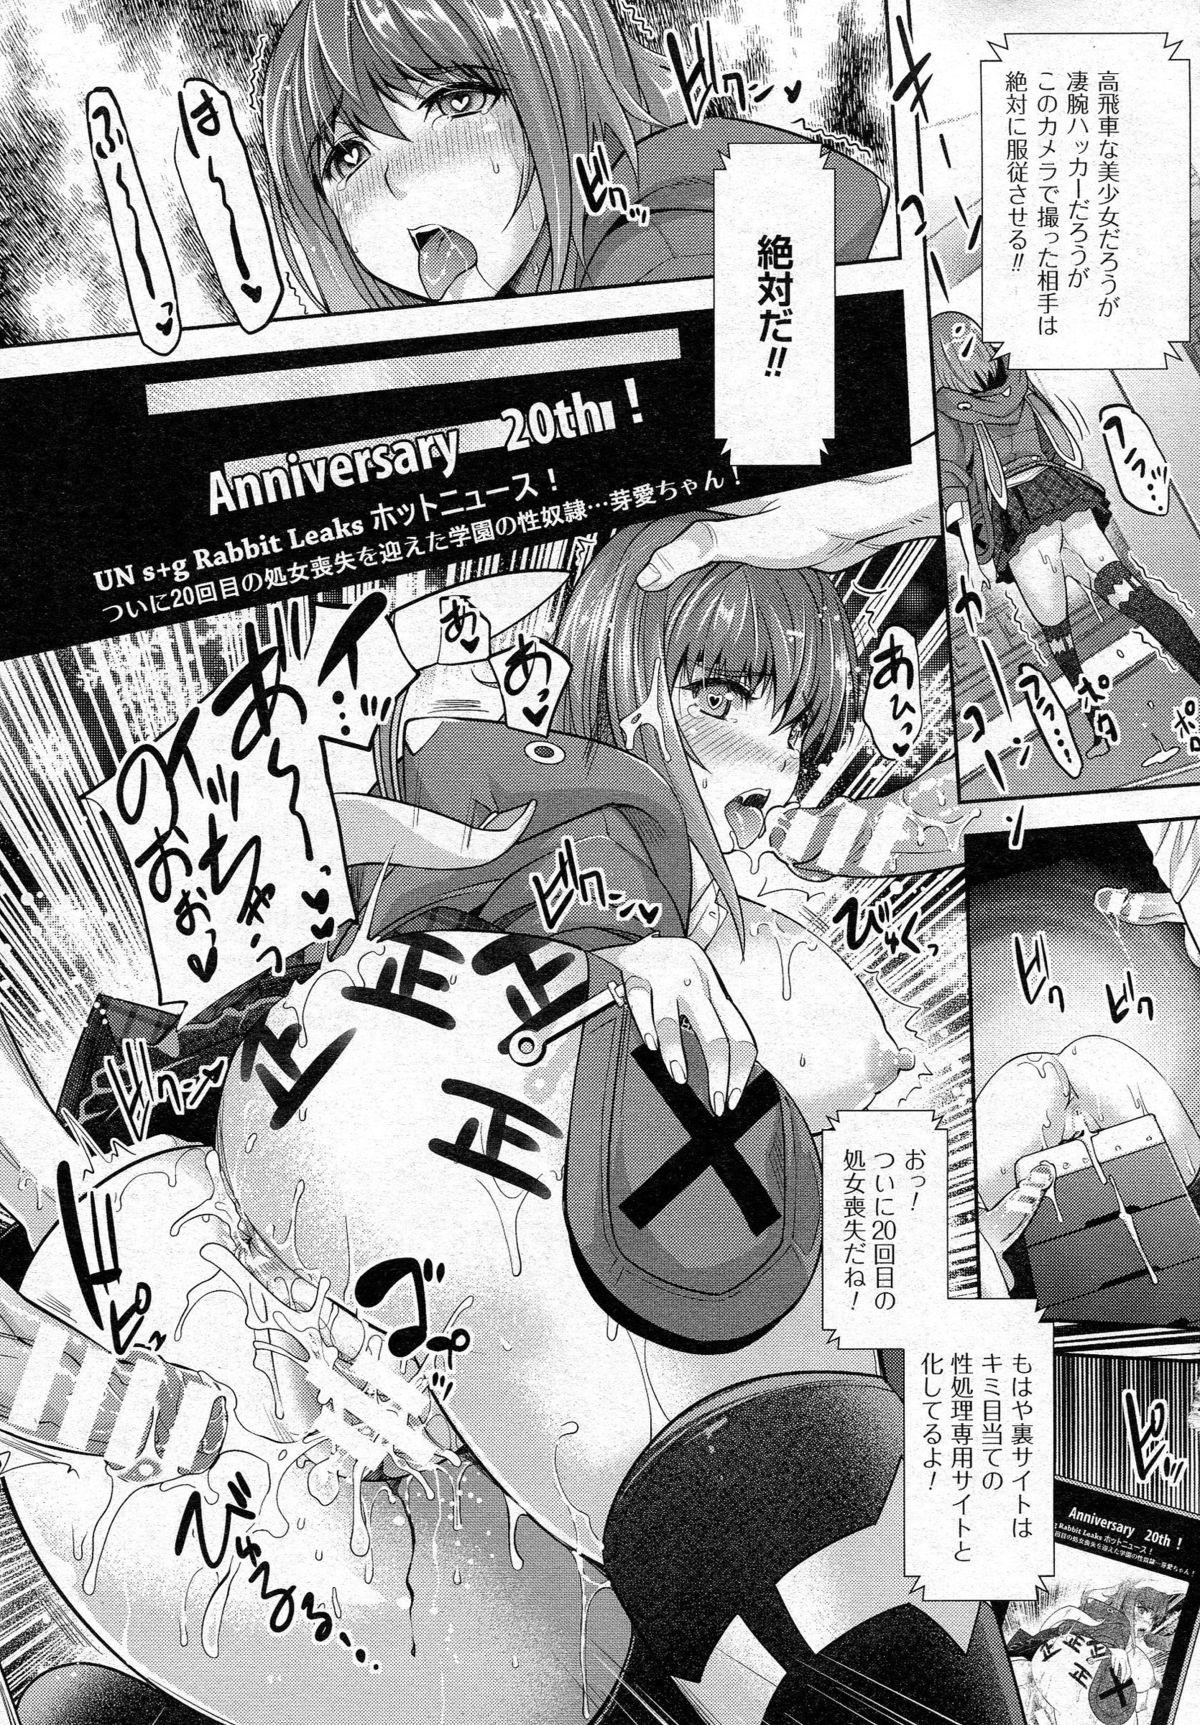 COMIC Unreal 2015-06 Vol. 55 + Hisasi Illust Shuu 261